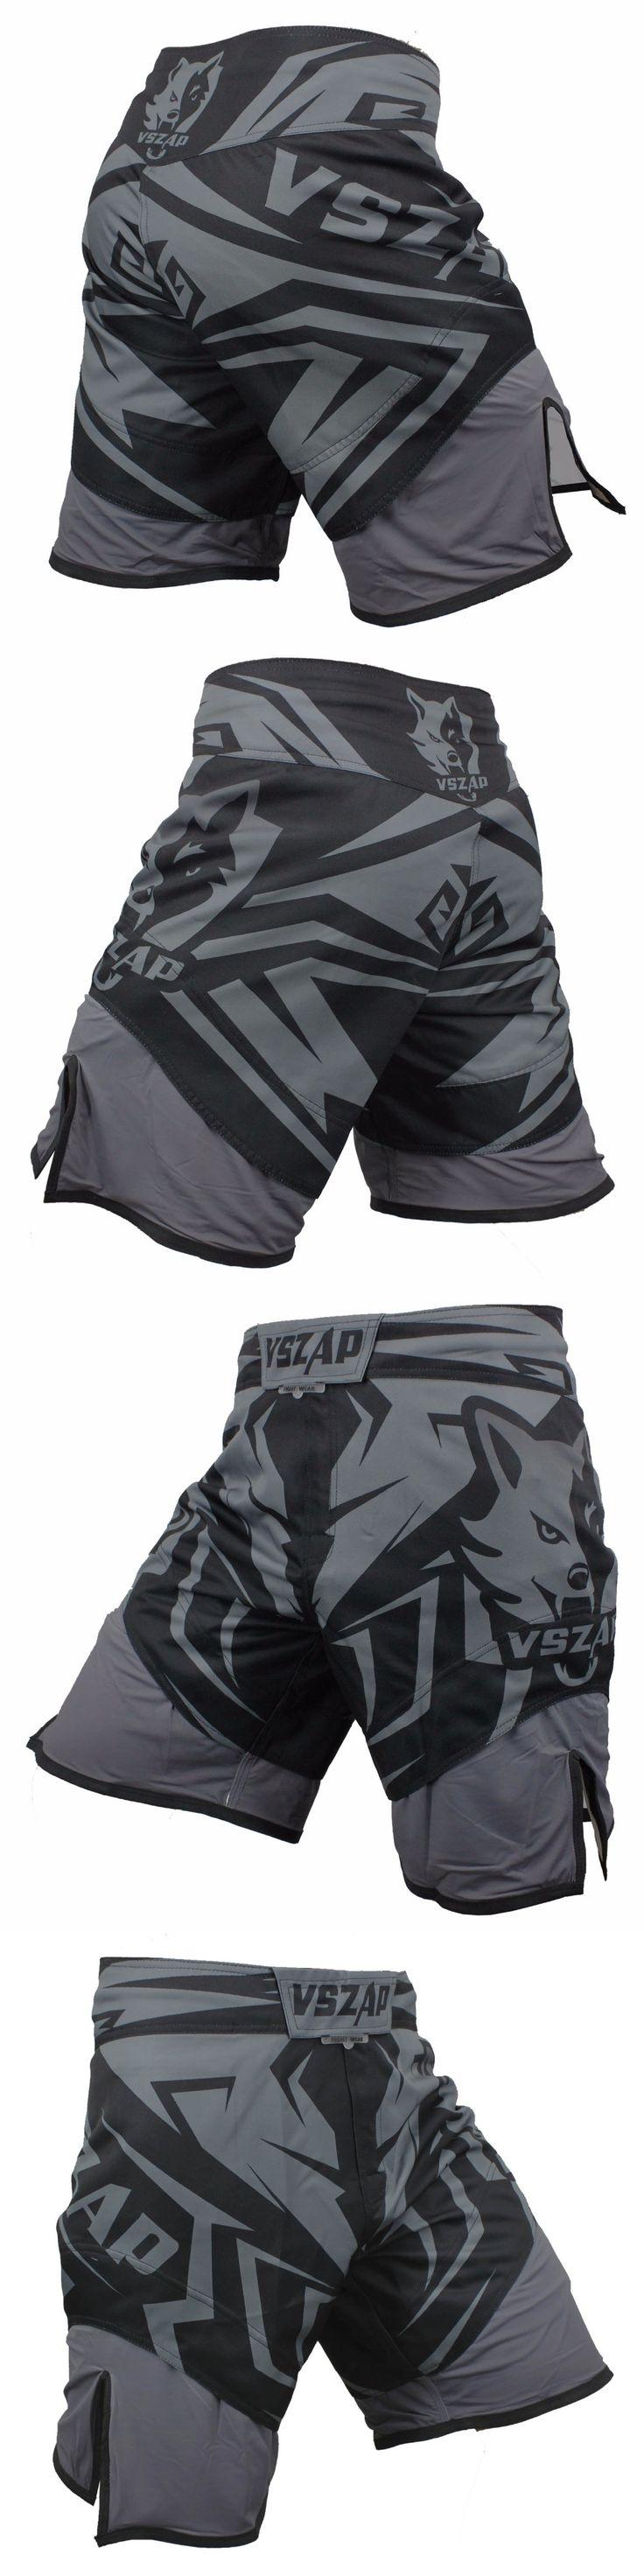 VSZAP  Fight Shorts MMA Shorts For Men Sotf MMA Muay Thai  Shorts Trunks Grappling Sanda Kickboxing  Boxe